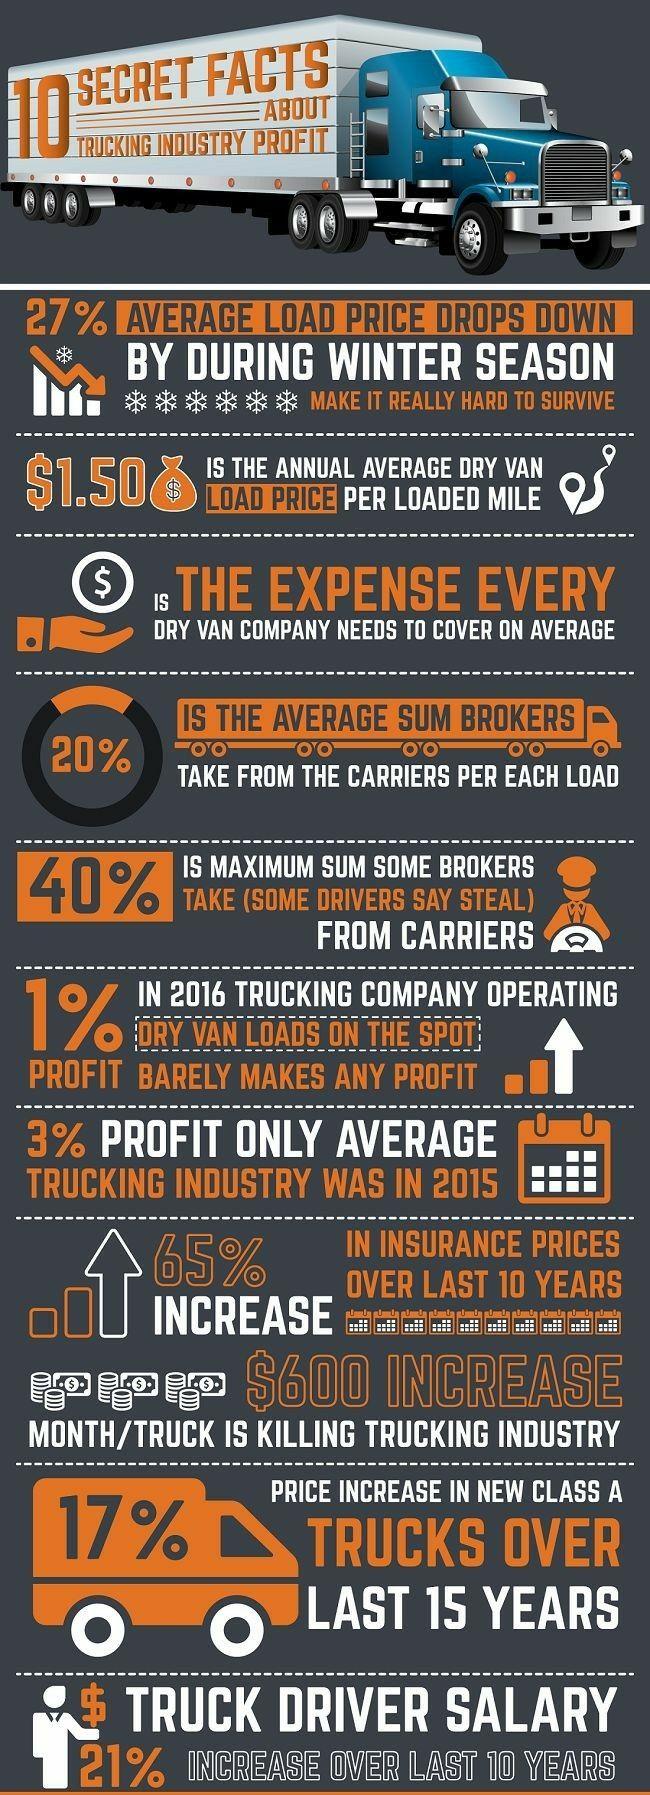 Pin By Katrina Duffey On New4 Truck Driver Jobs Truck Driving